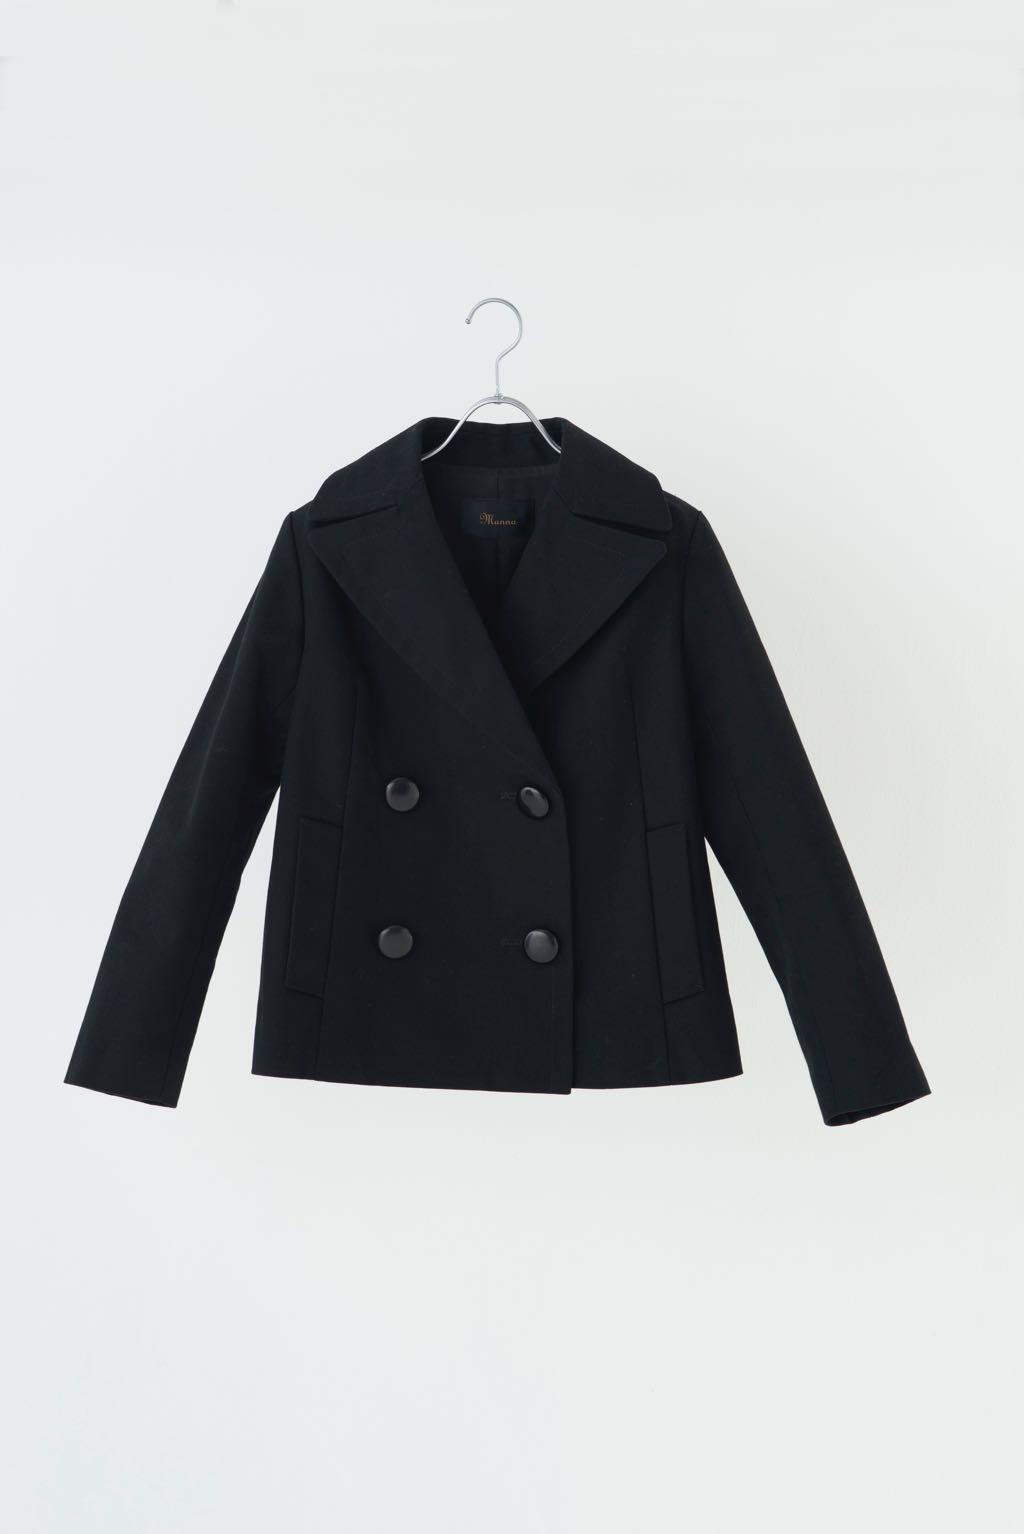 PEA COAT 161806 ¥39,000+tax